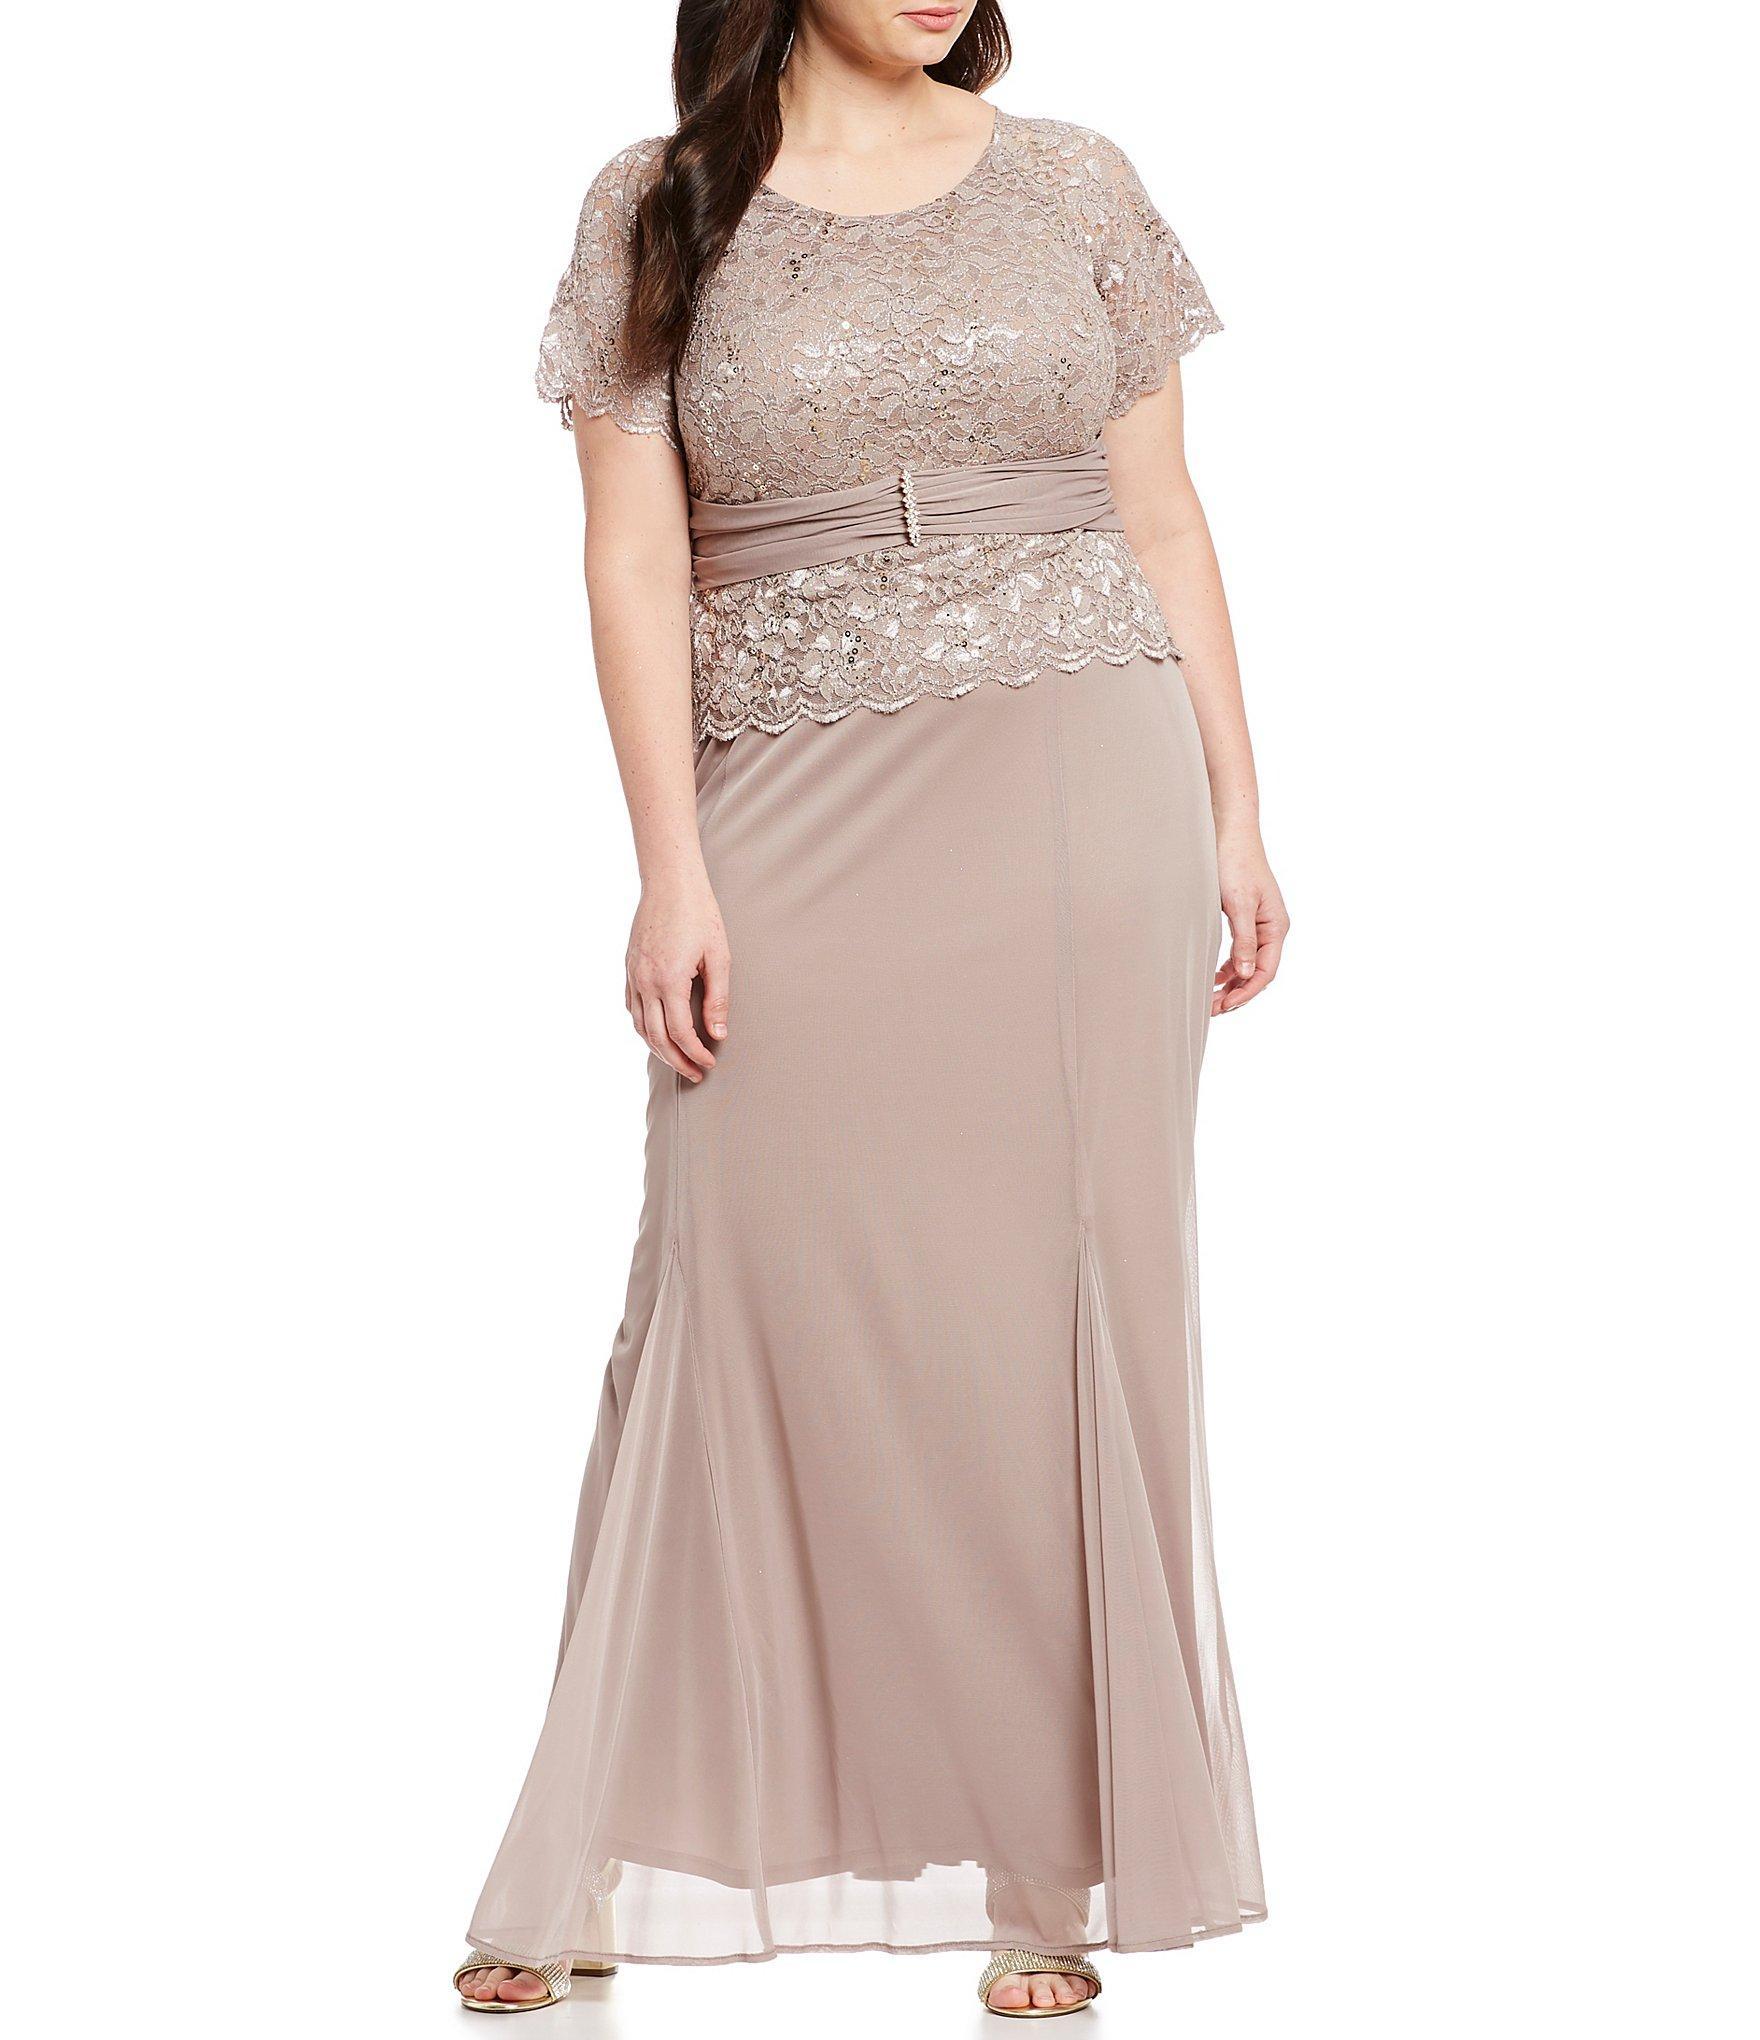 Dillards Plus Size Short Prom Dresses